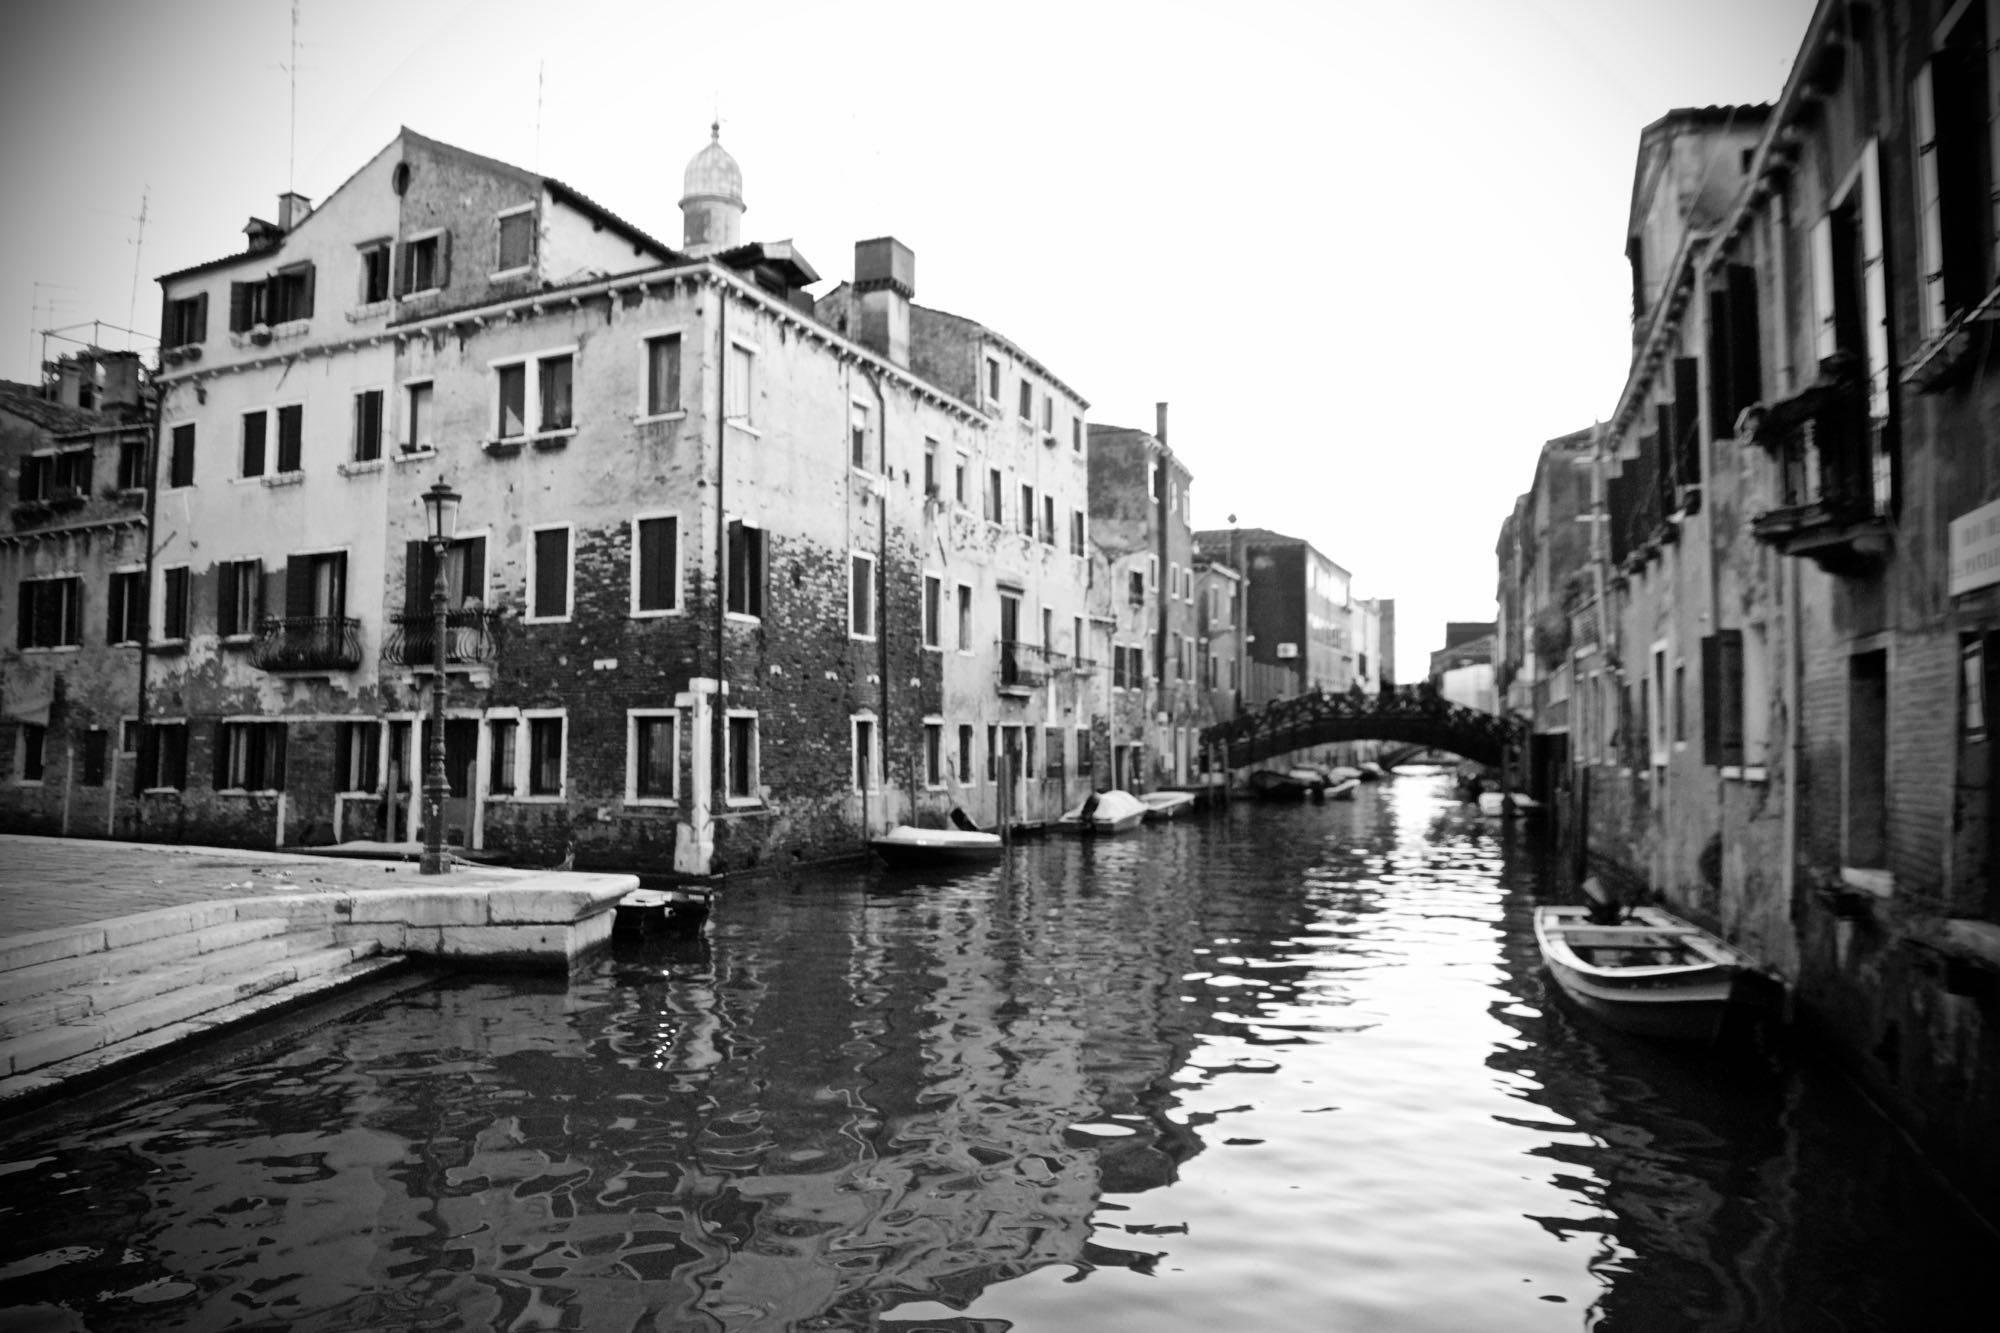 Massimiliano Scarpa photographer_Venezia_2015 - 4